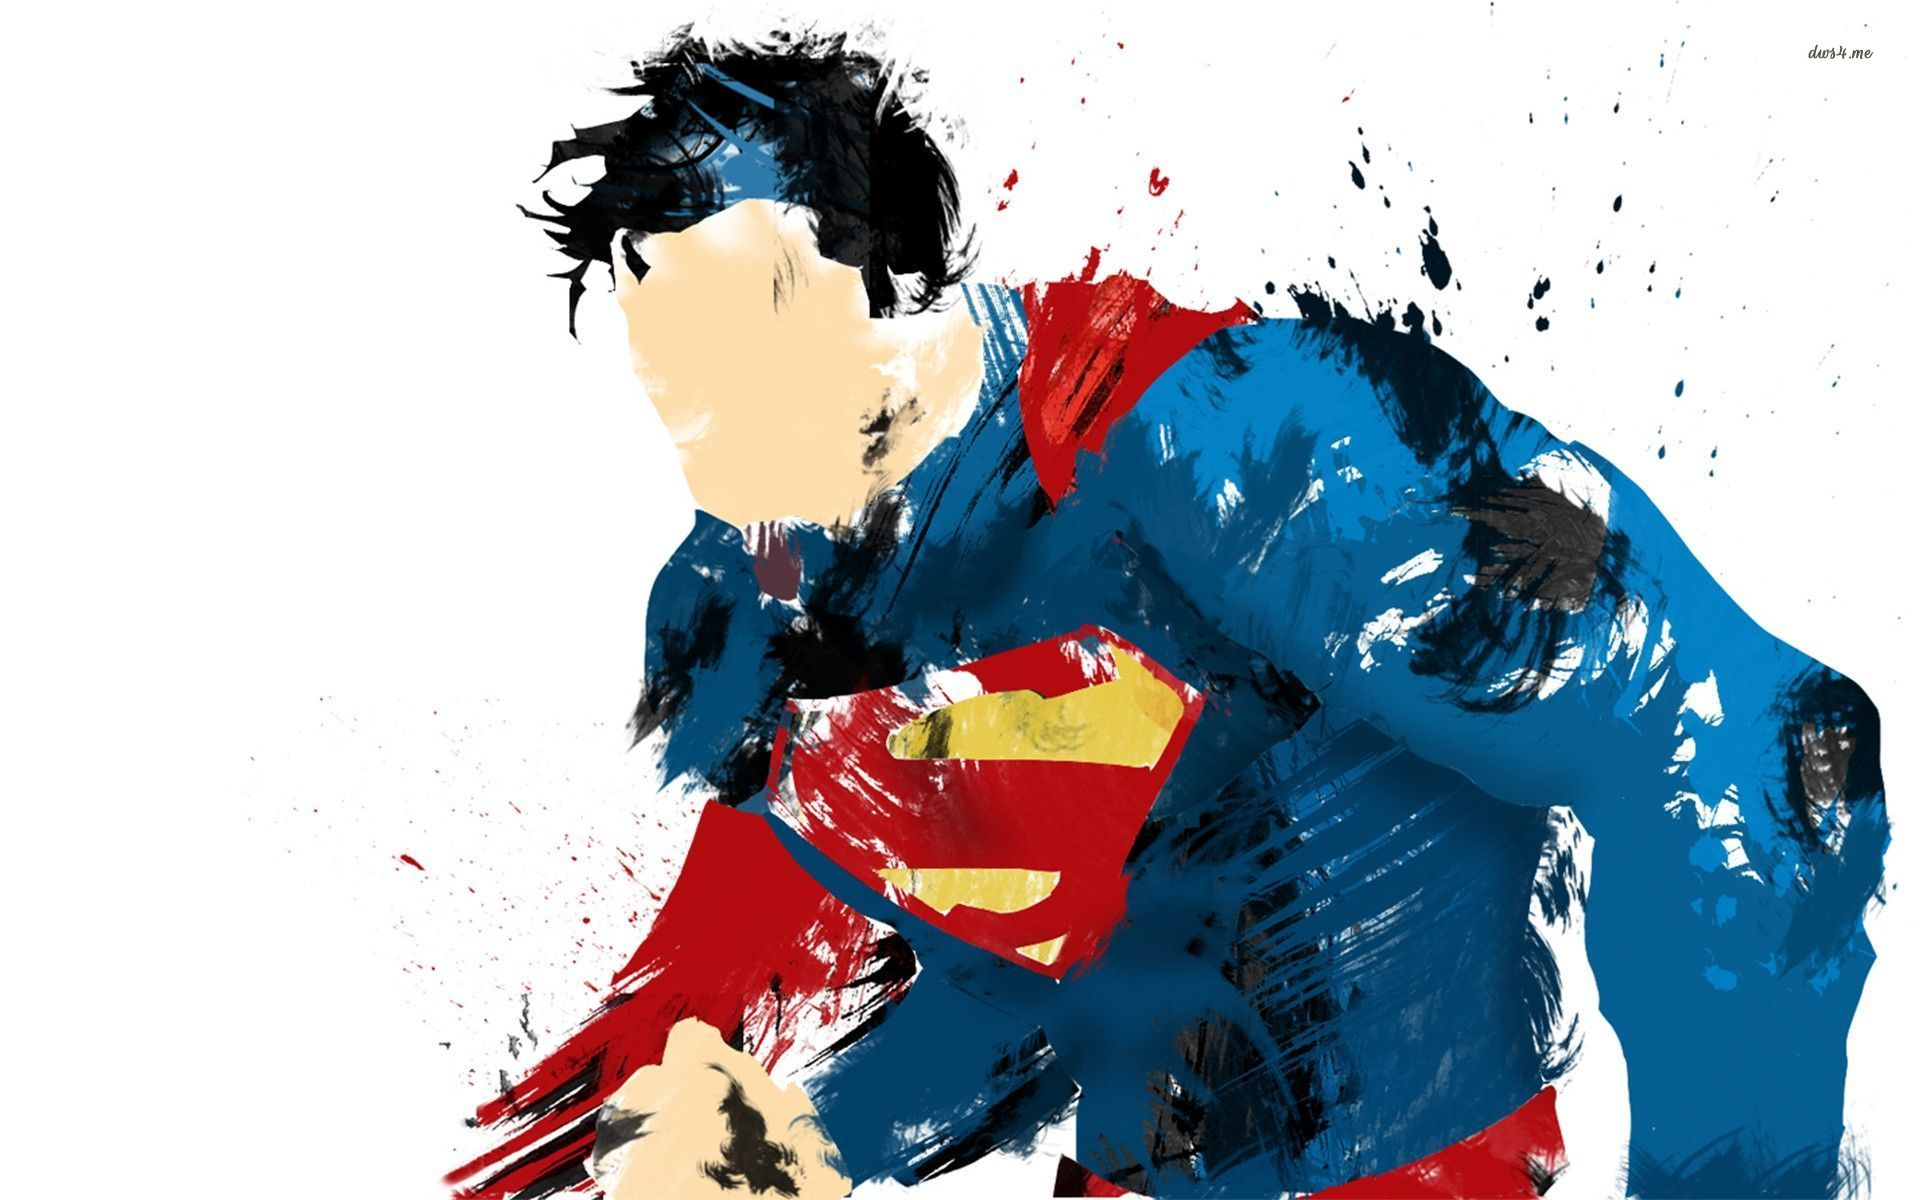 Best 35 Superman HD Wallpaper for Desktop 1920x1200